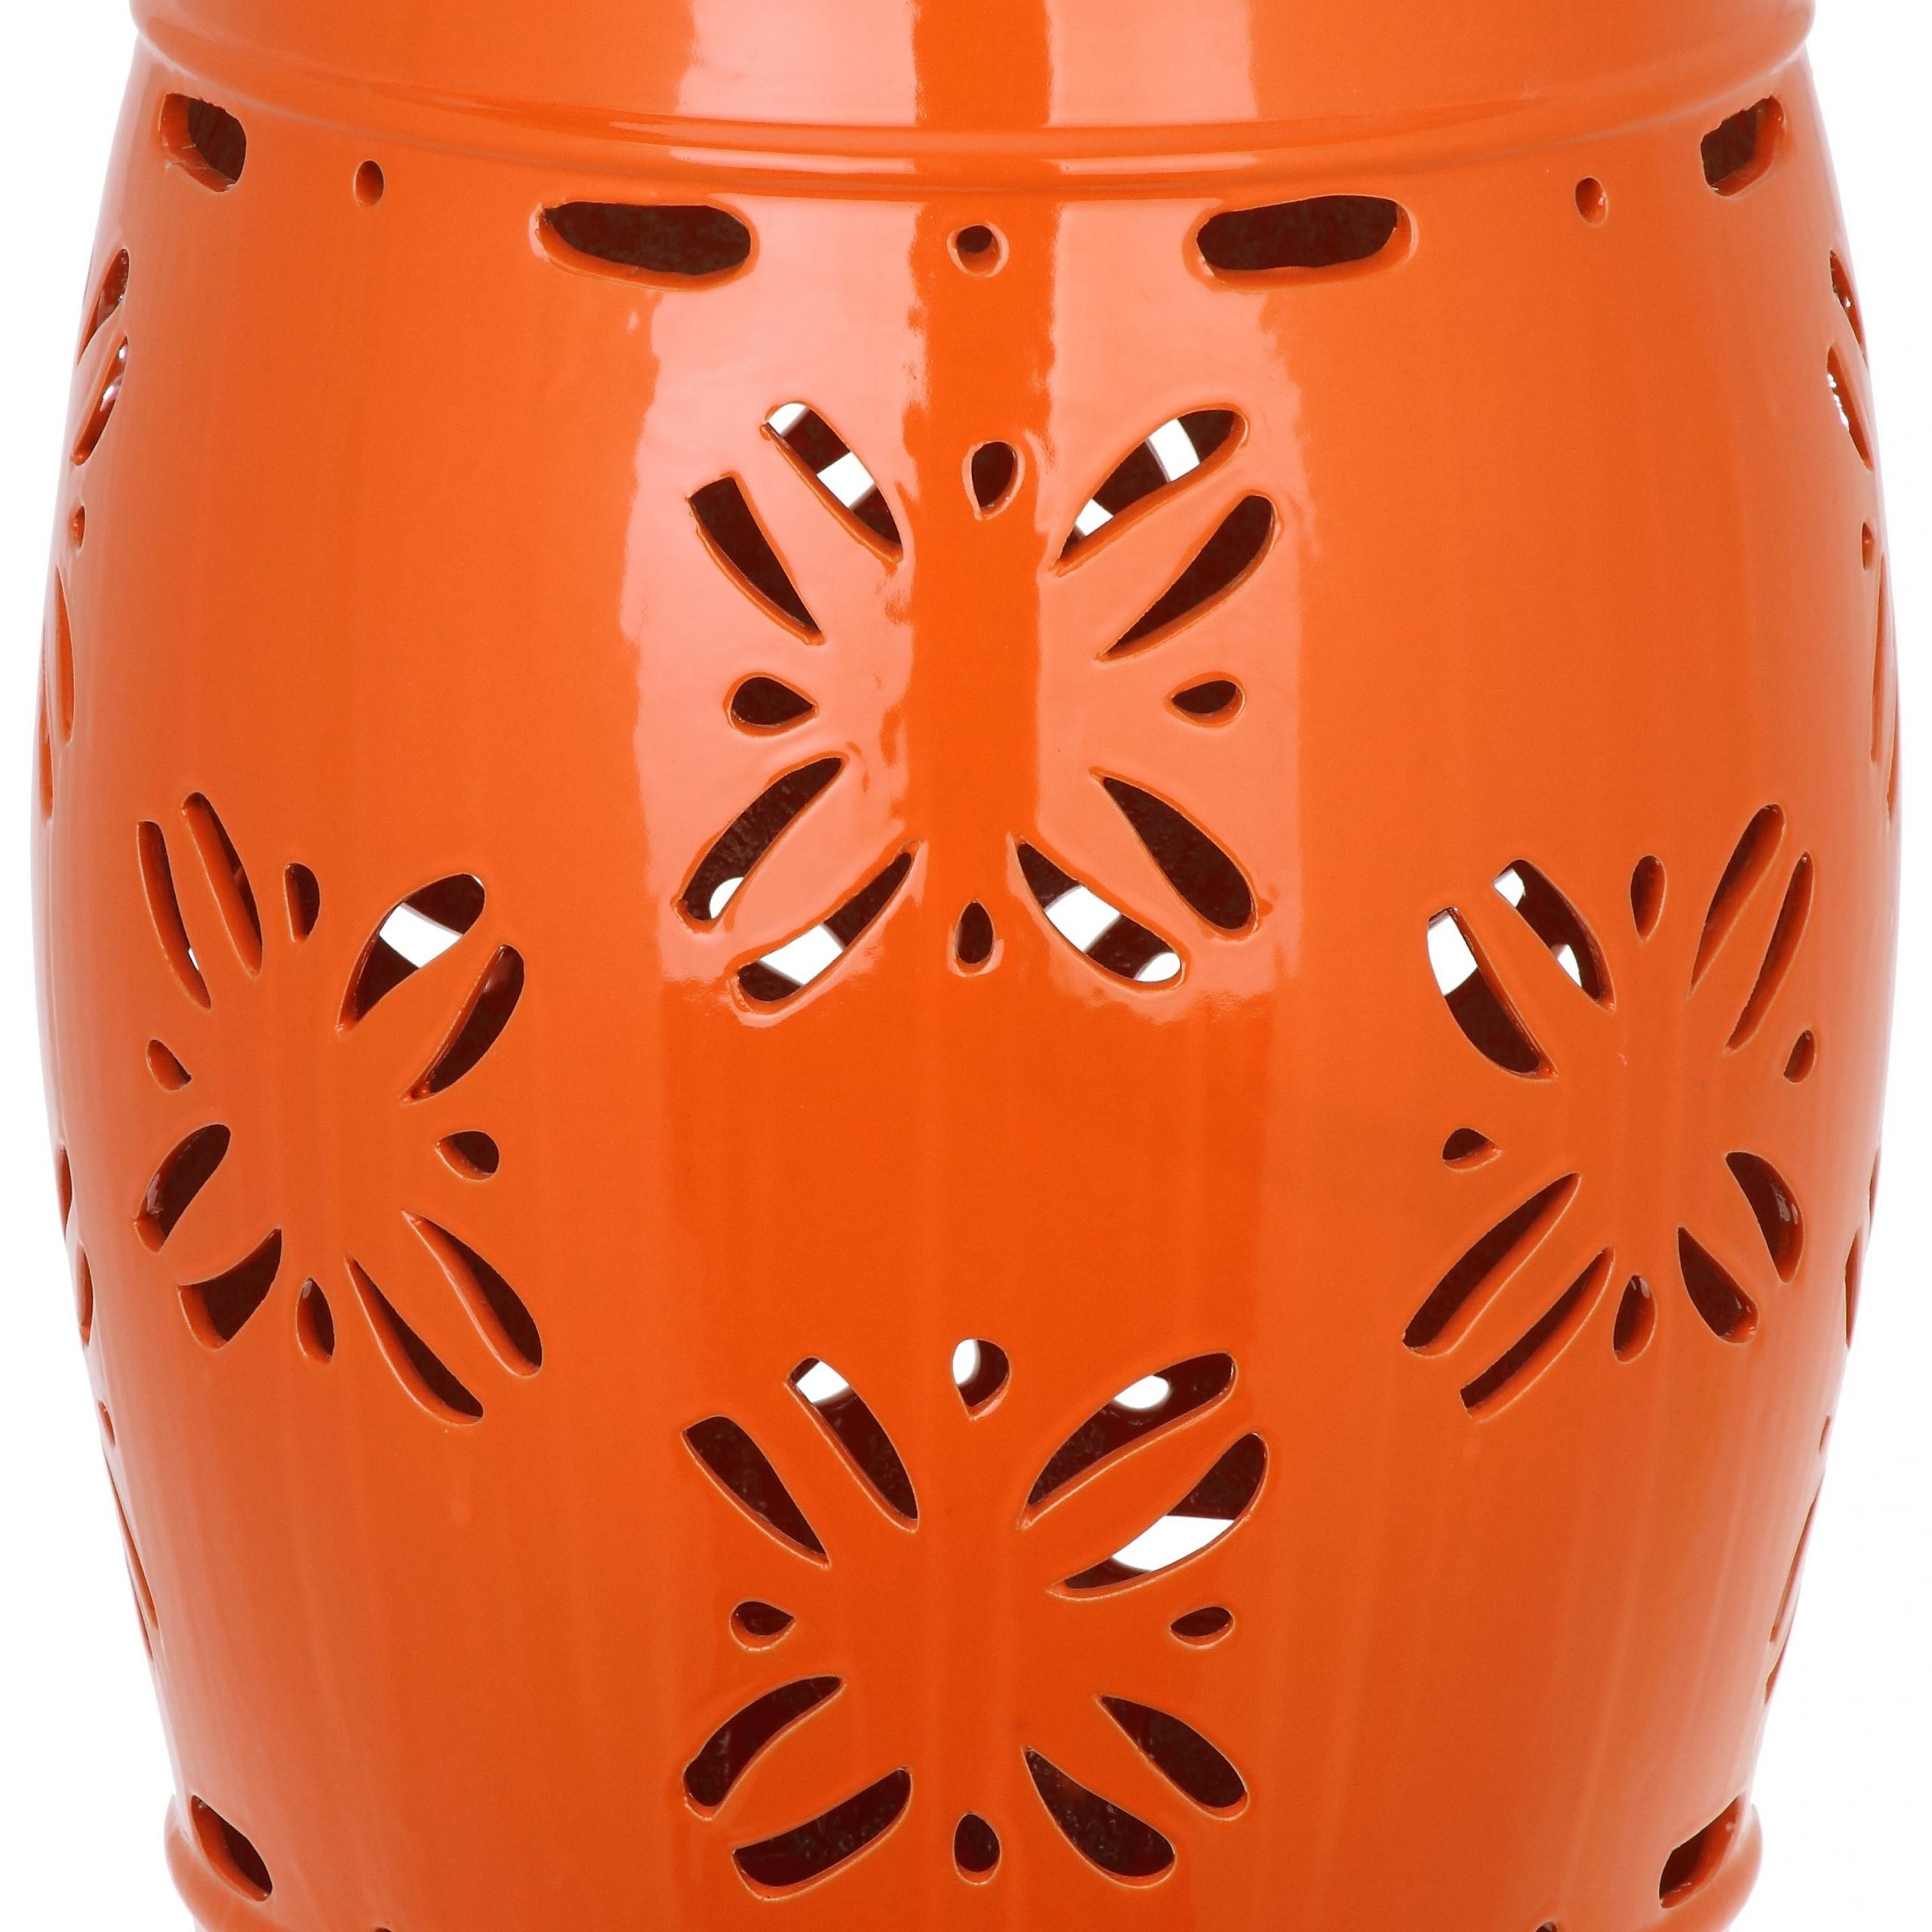 Keswick Ceramic Garden Stools With Regard To Recent Ezzell Ceramic Garden Stool (View 26 of 30)